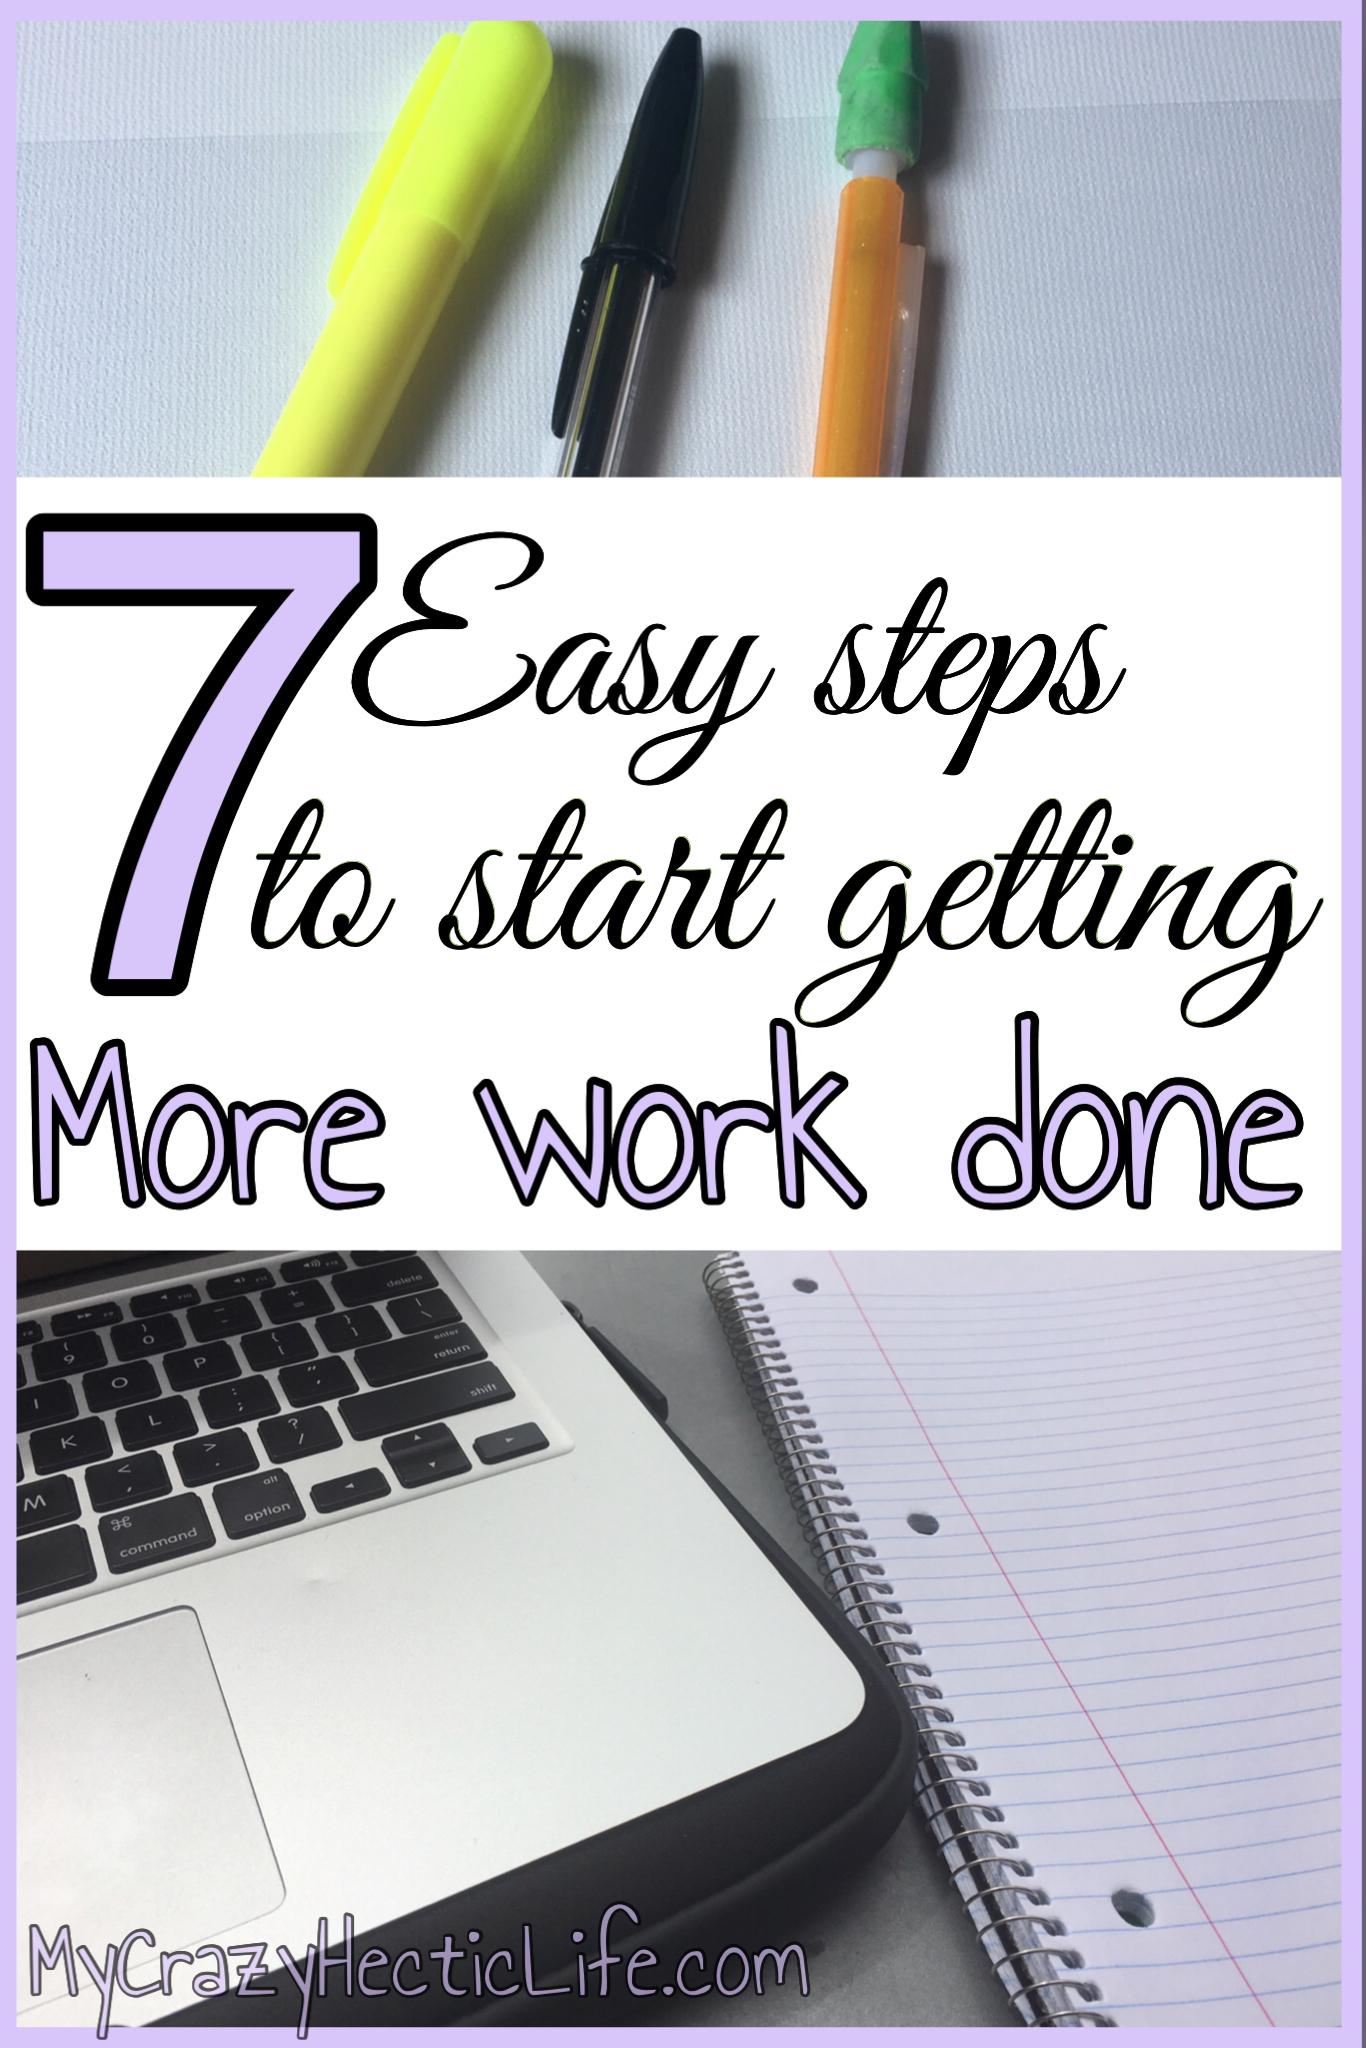 Start getting more work done ... like a boss!